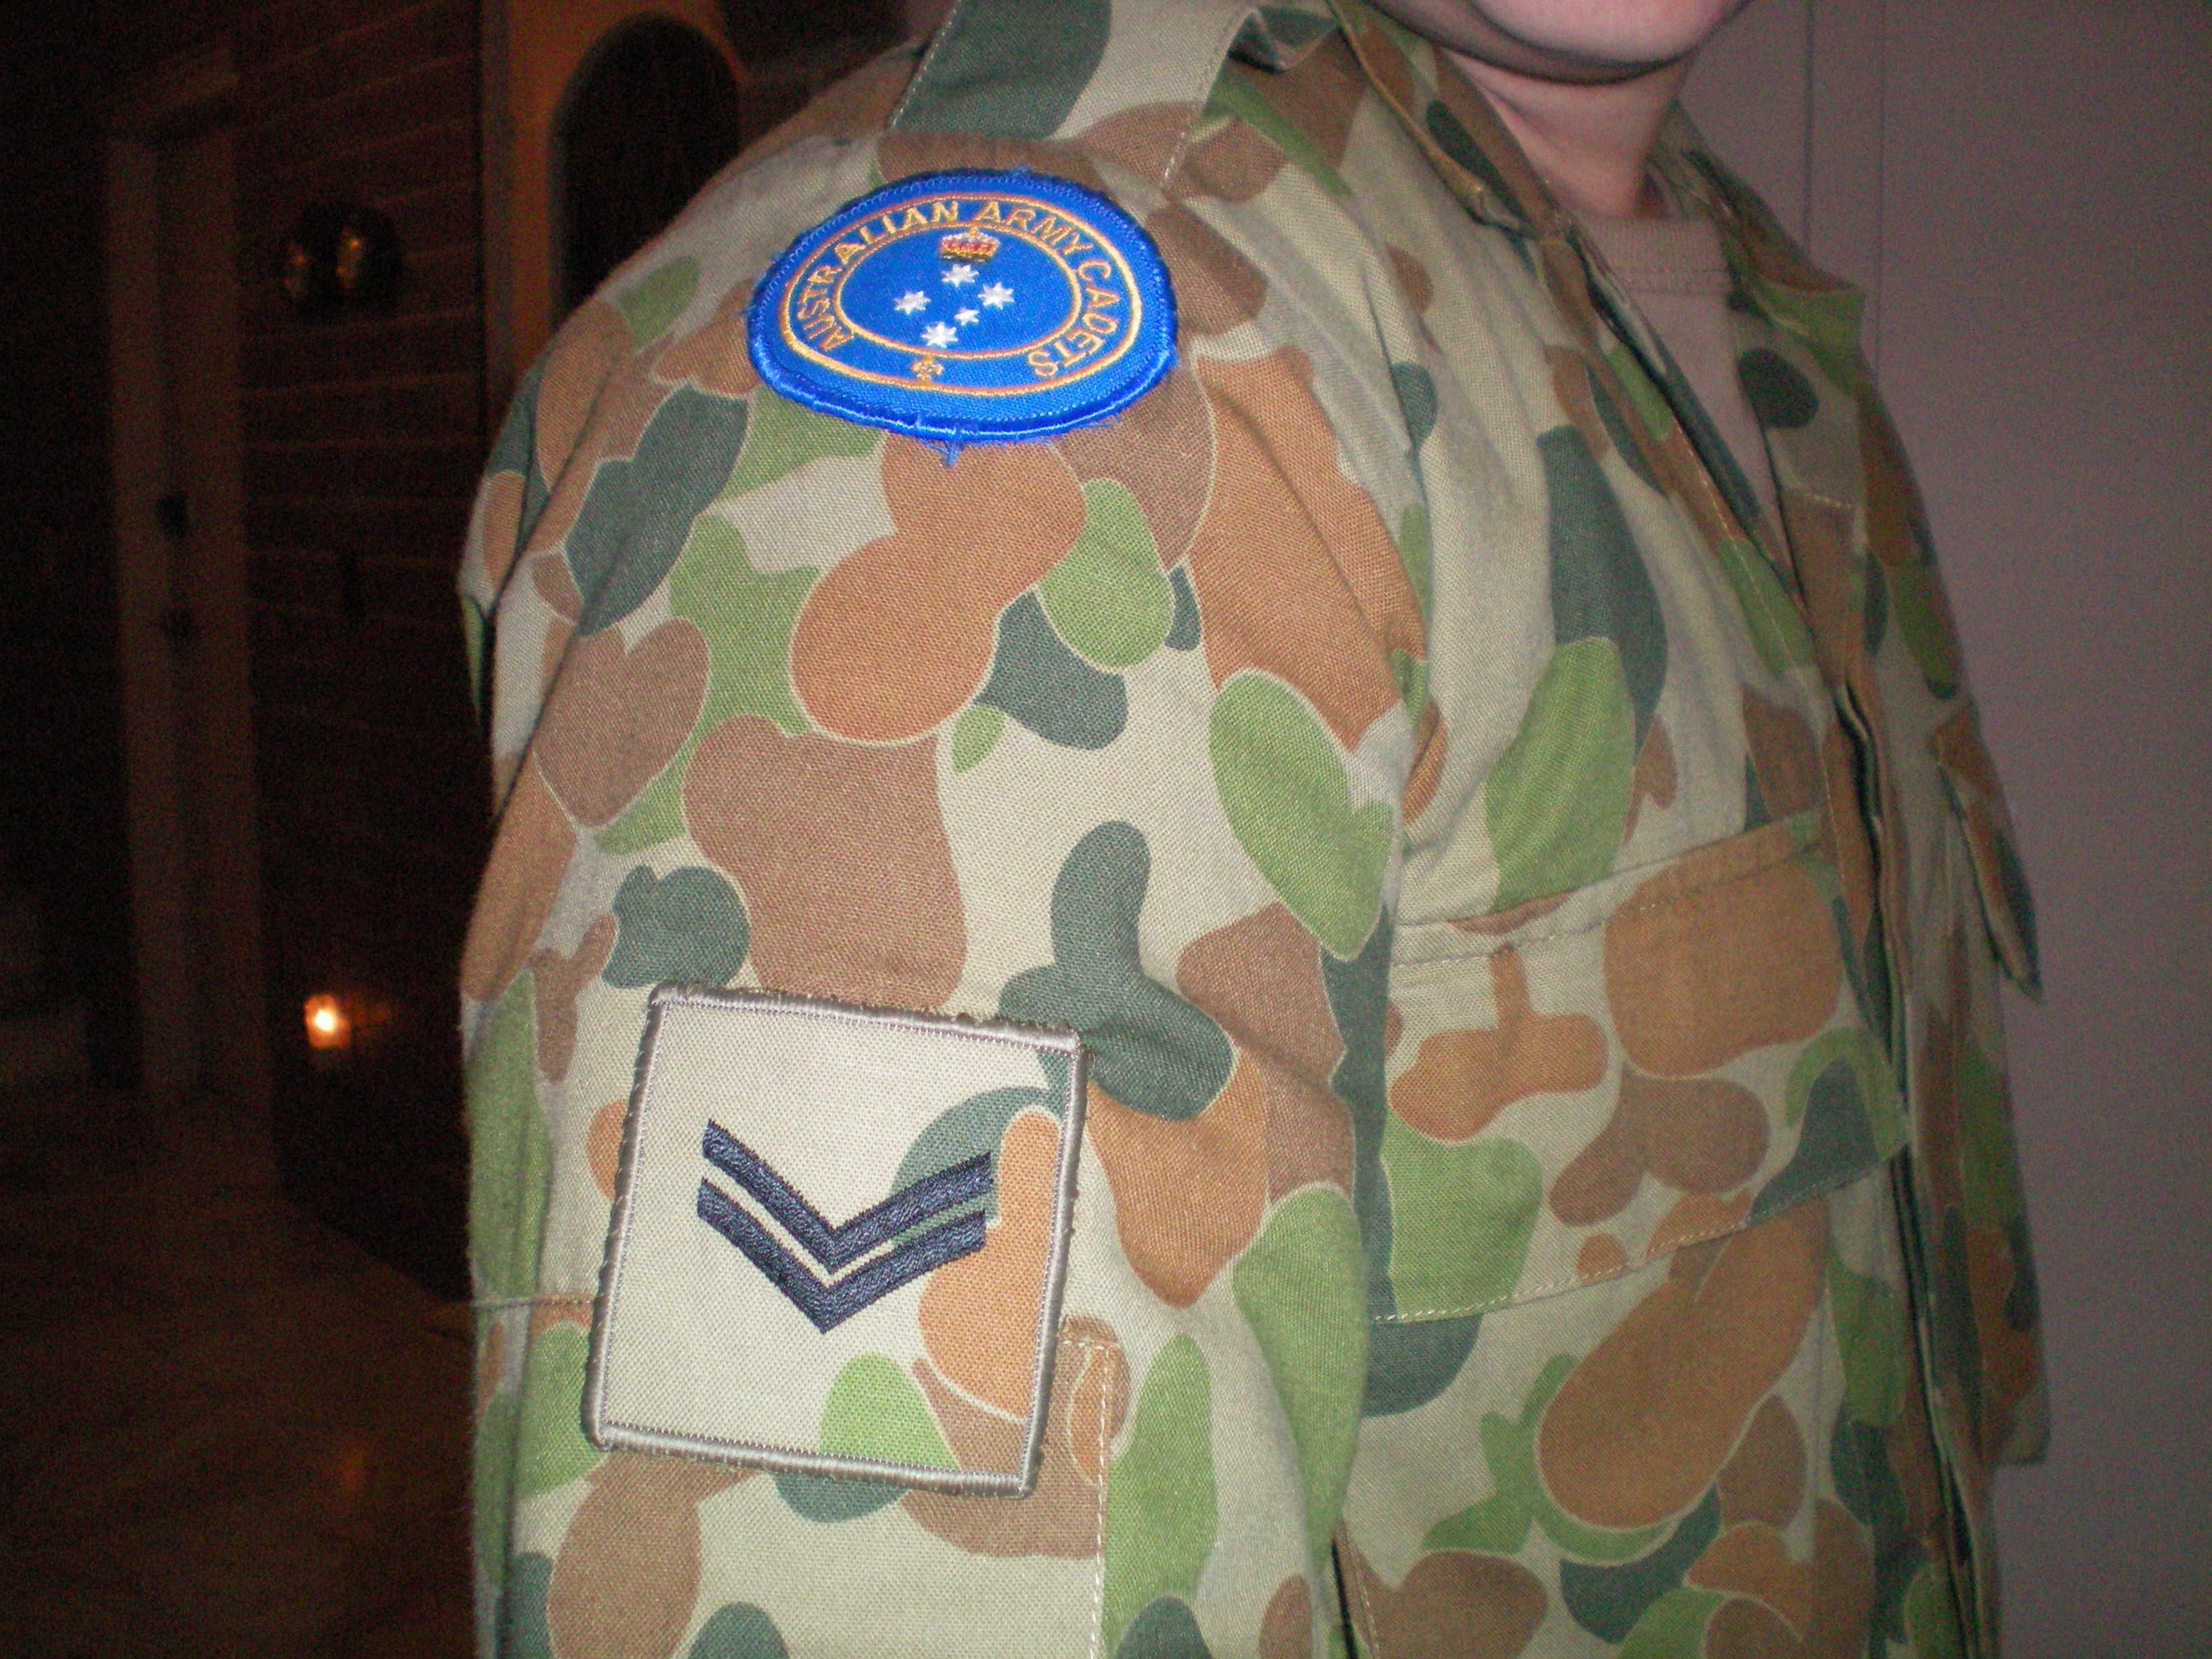 Cpl. Owen B., Australian Army